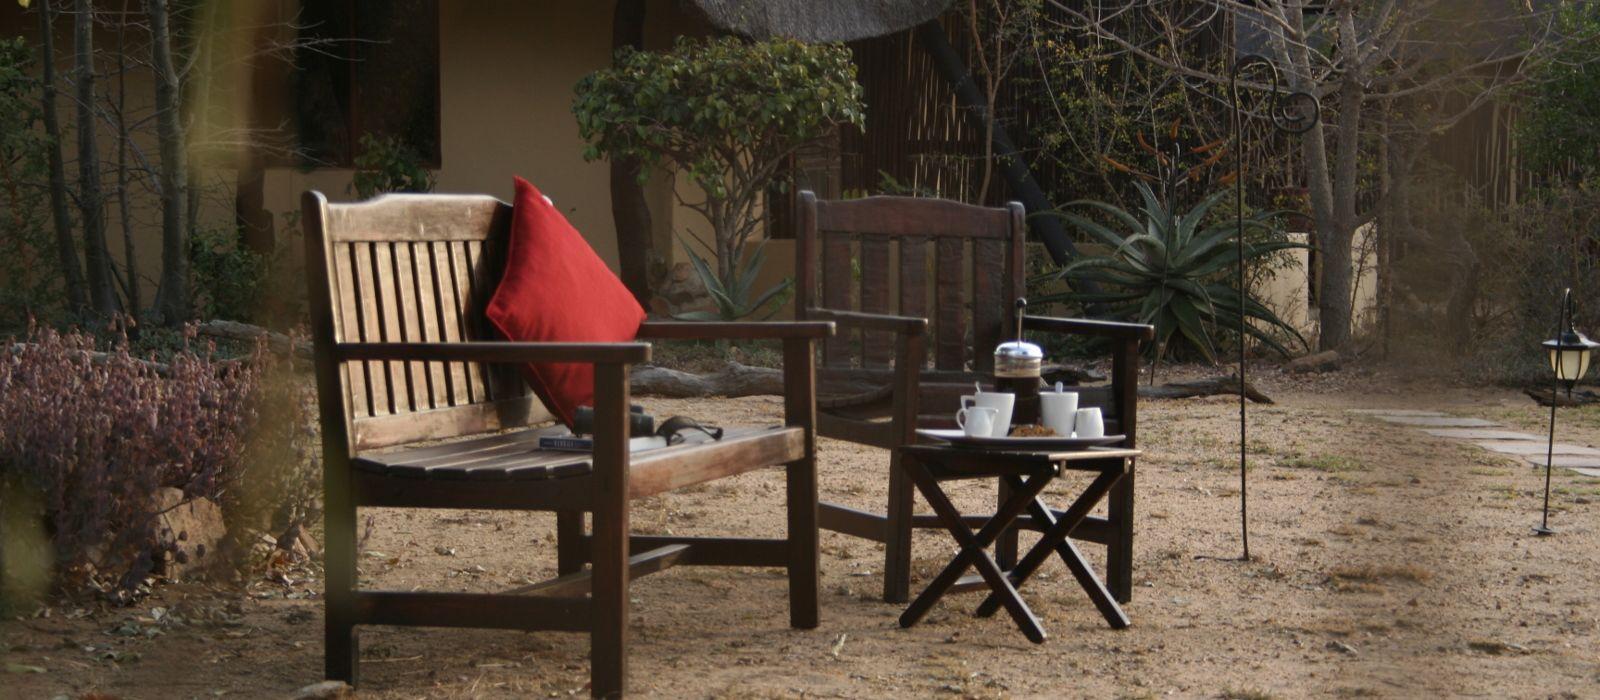 Hotel Kambaku Safari Lodge South Africa